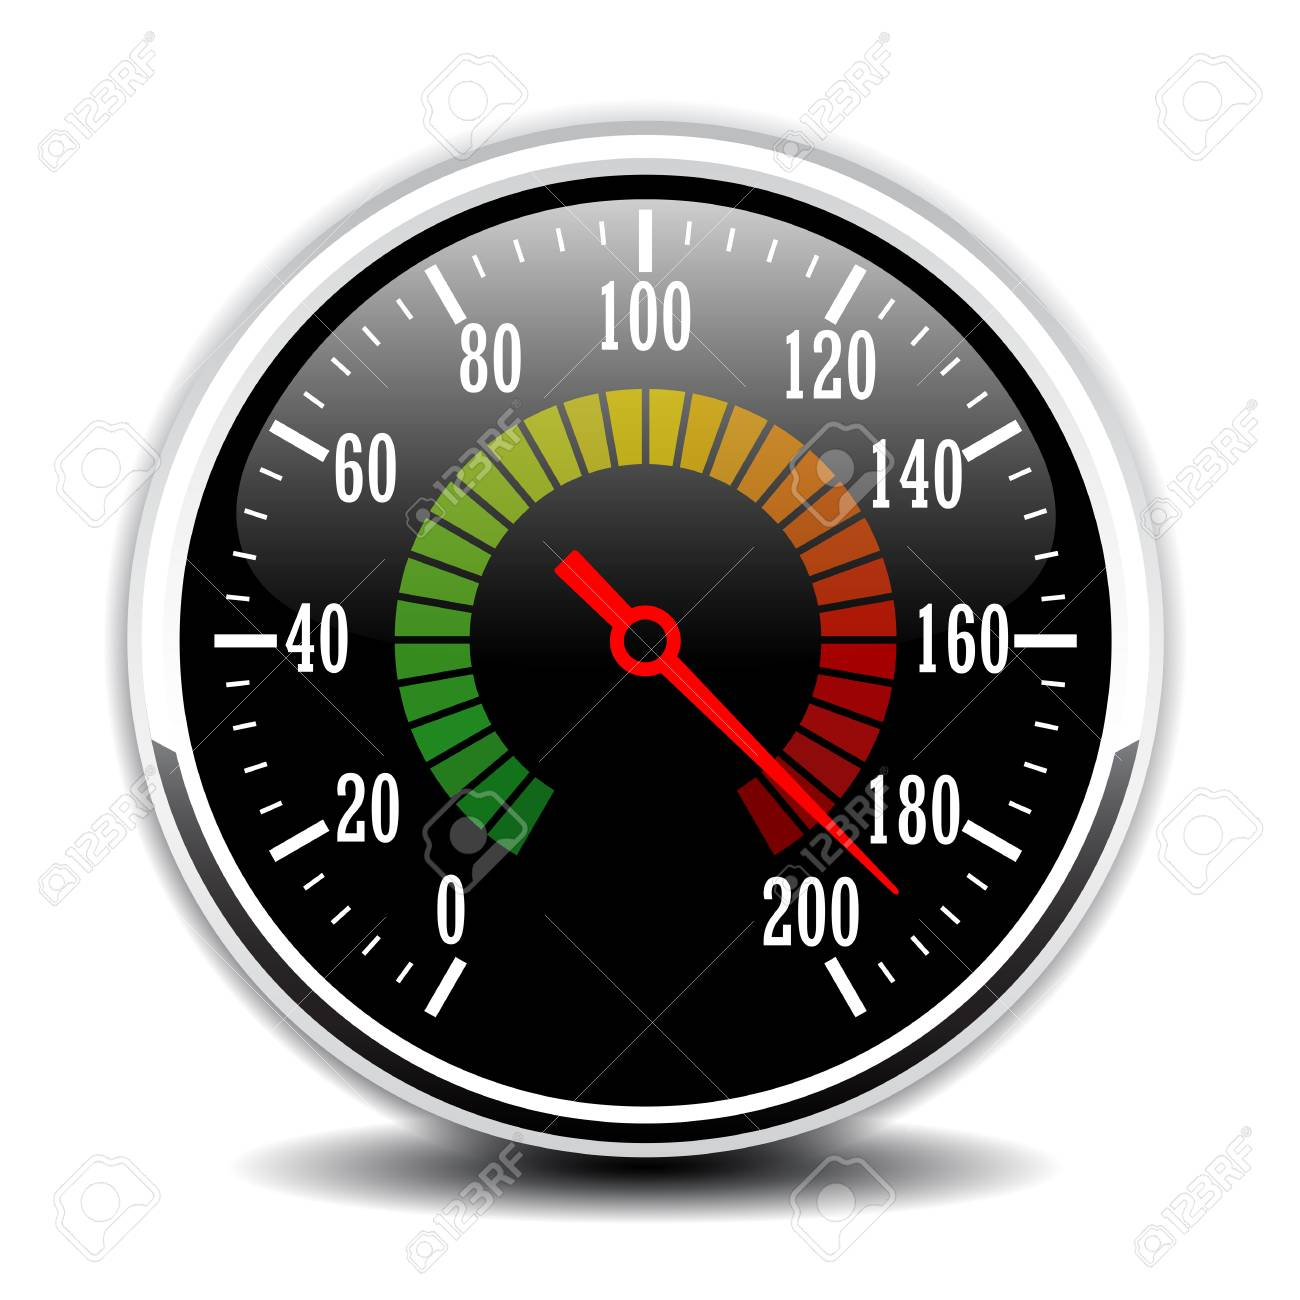 Car speedometer design vector illustration - 88992575